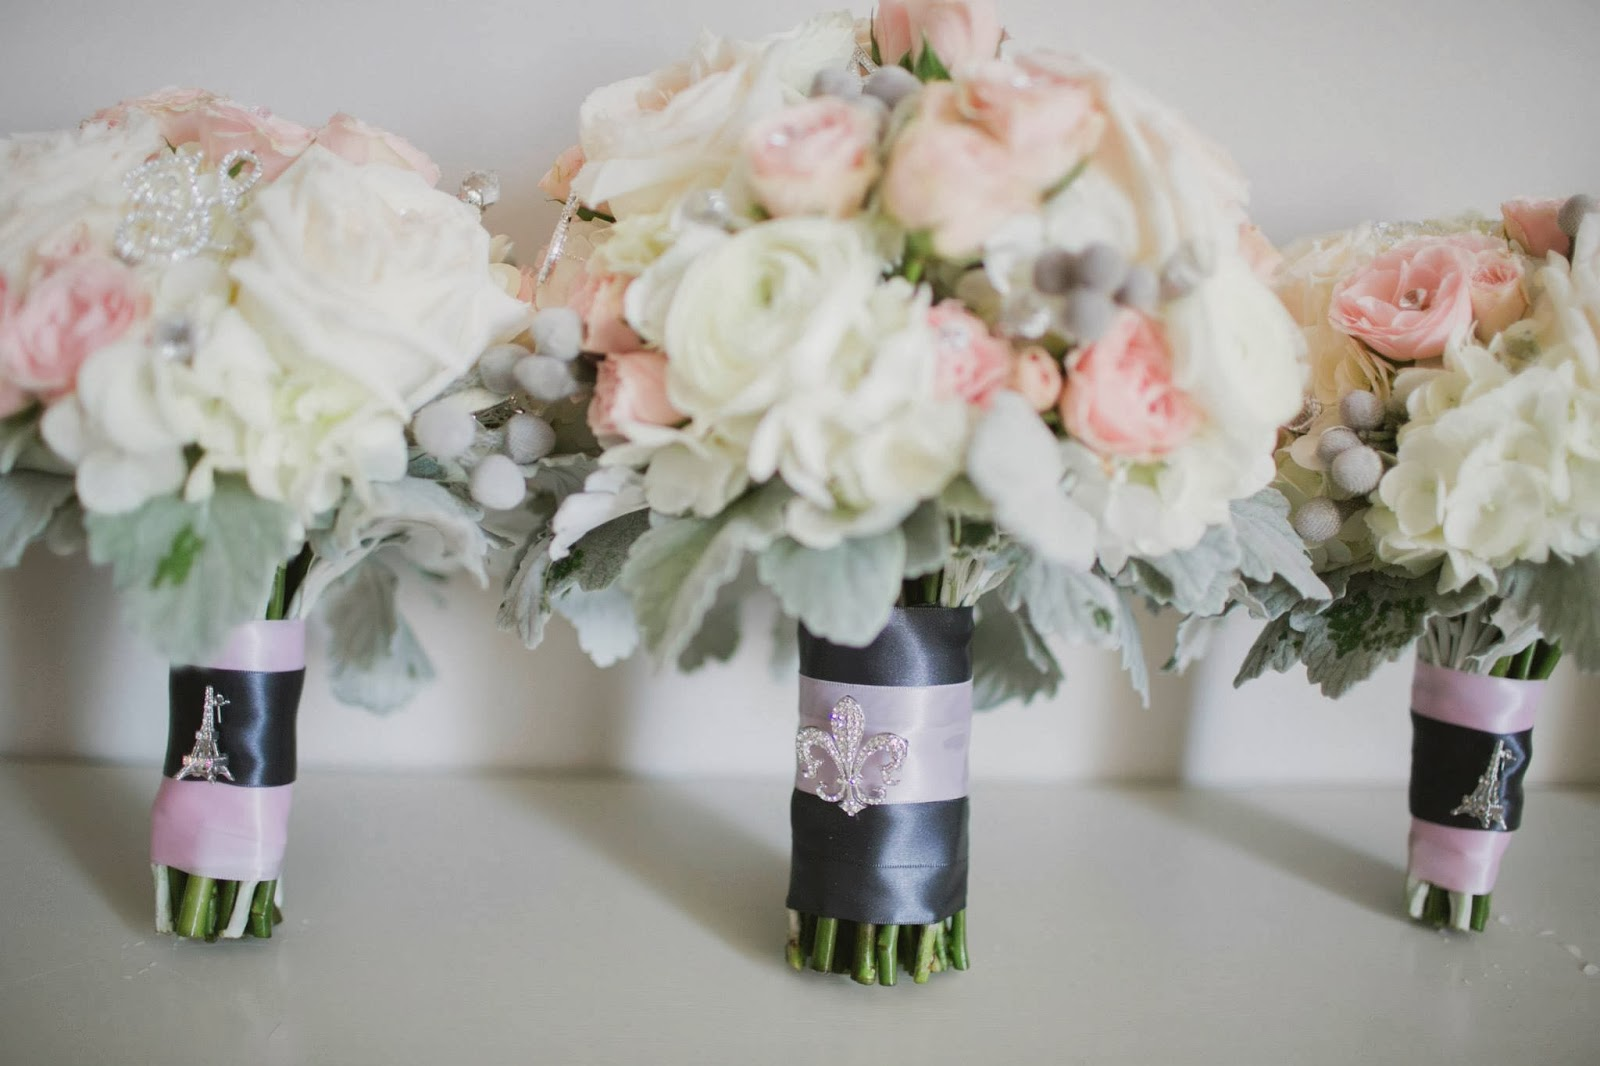 lush florals elizabeth in love casablanca winery inn grimsby wedding photos, kj and co wedding burlington ontario planner